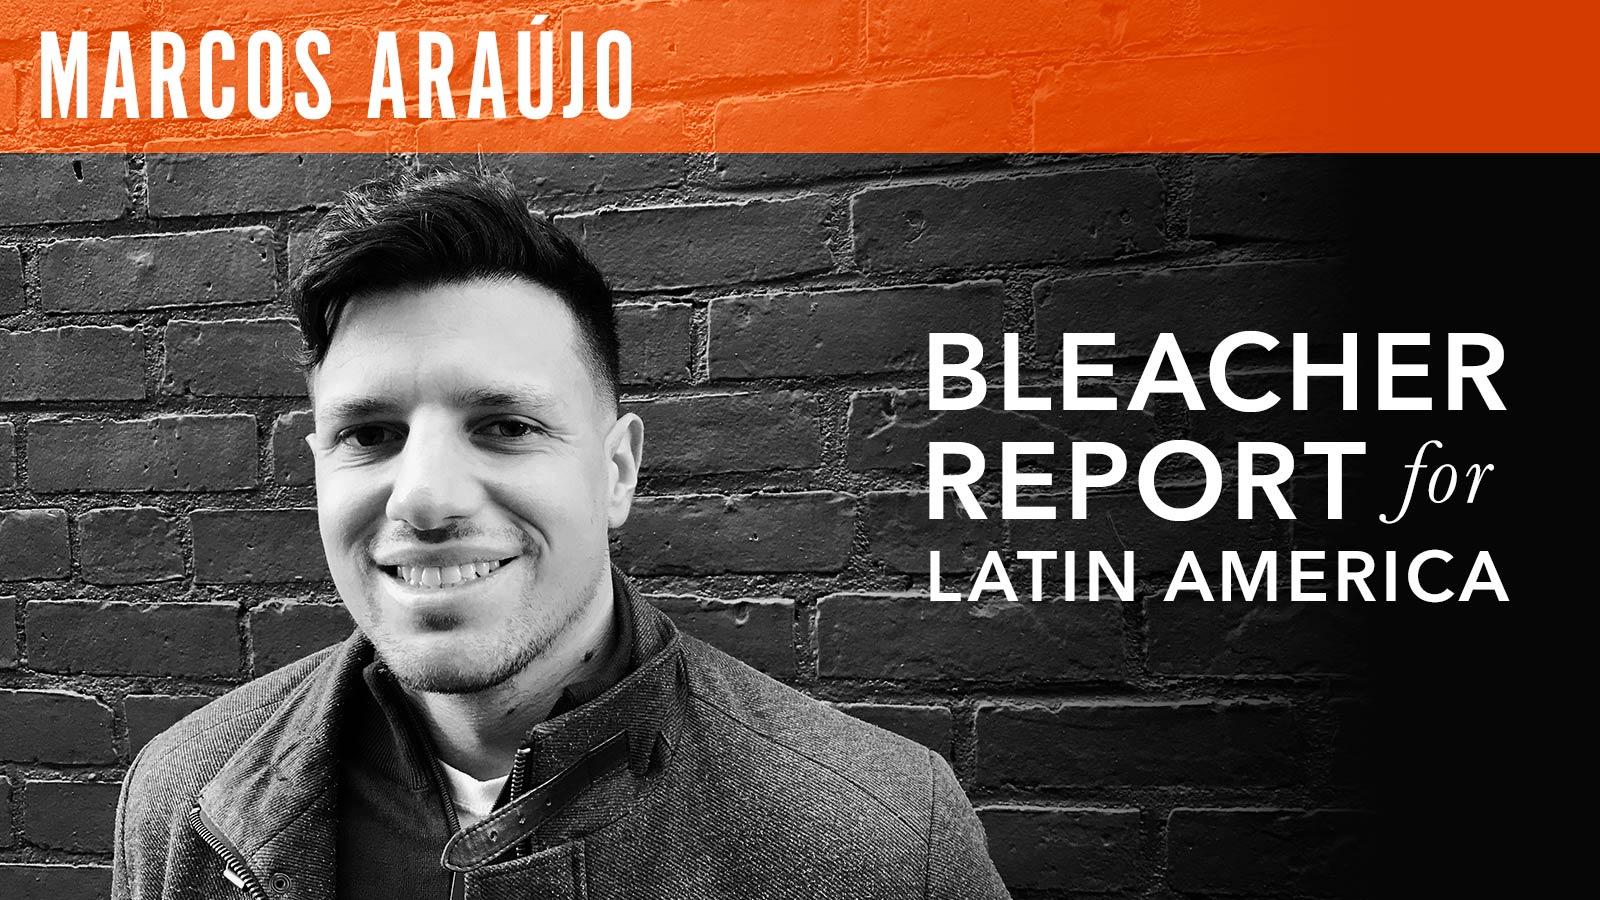 Marcos Araújo  Bleacher Report for Latin America